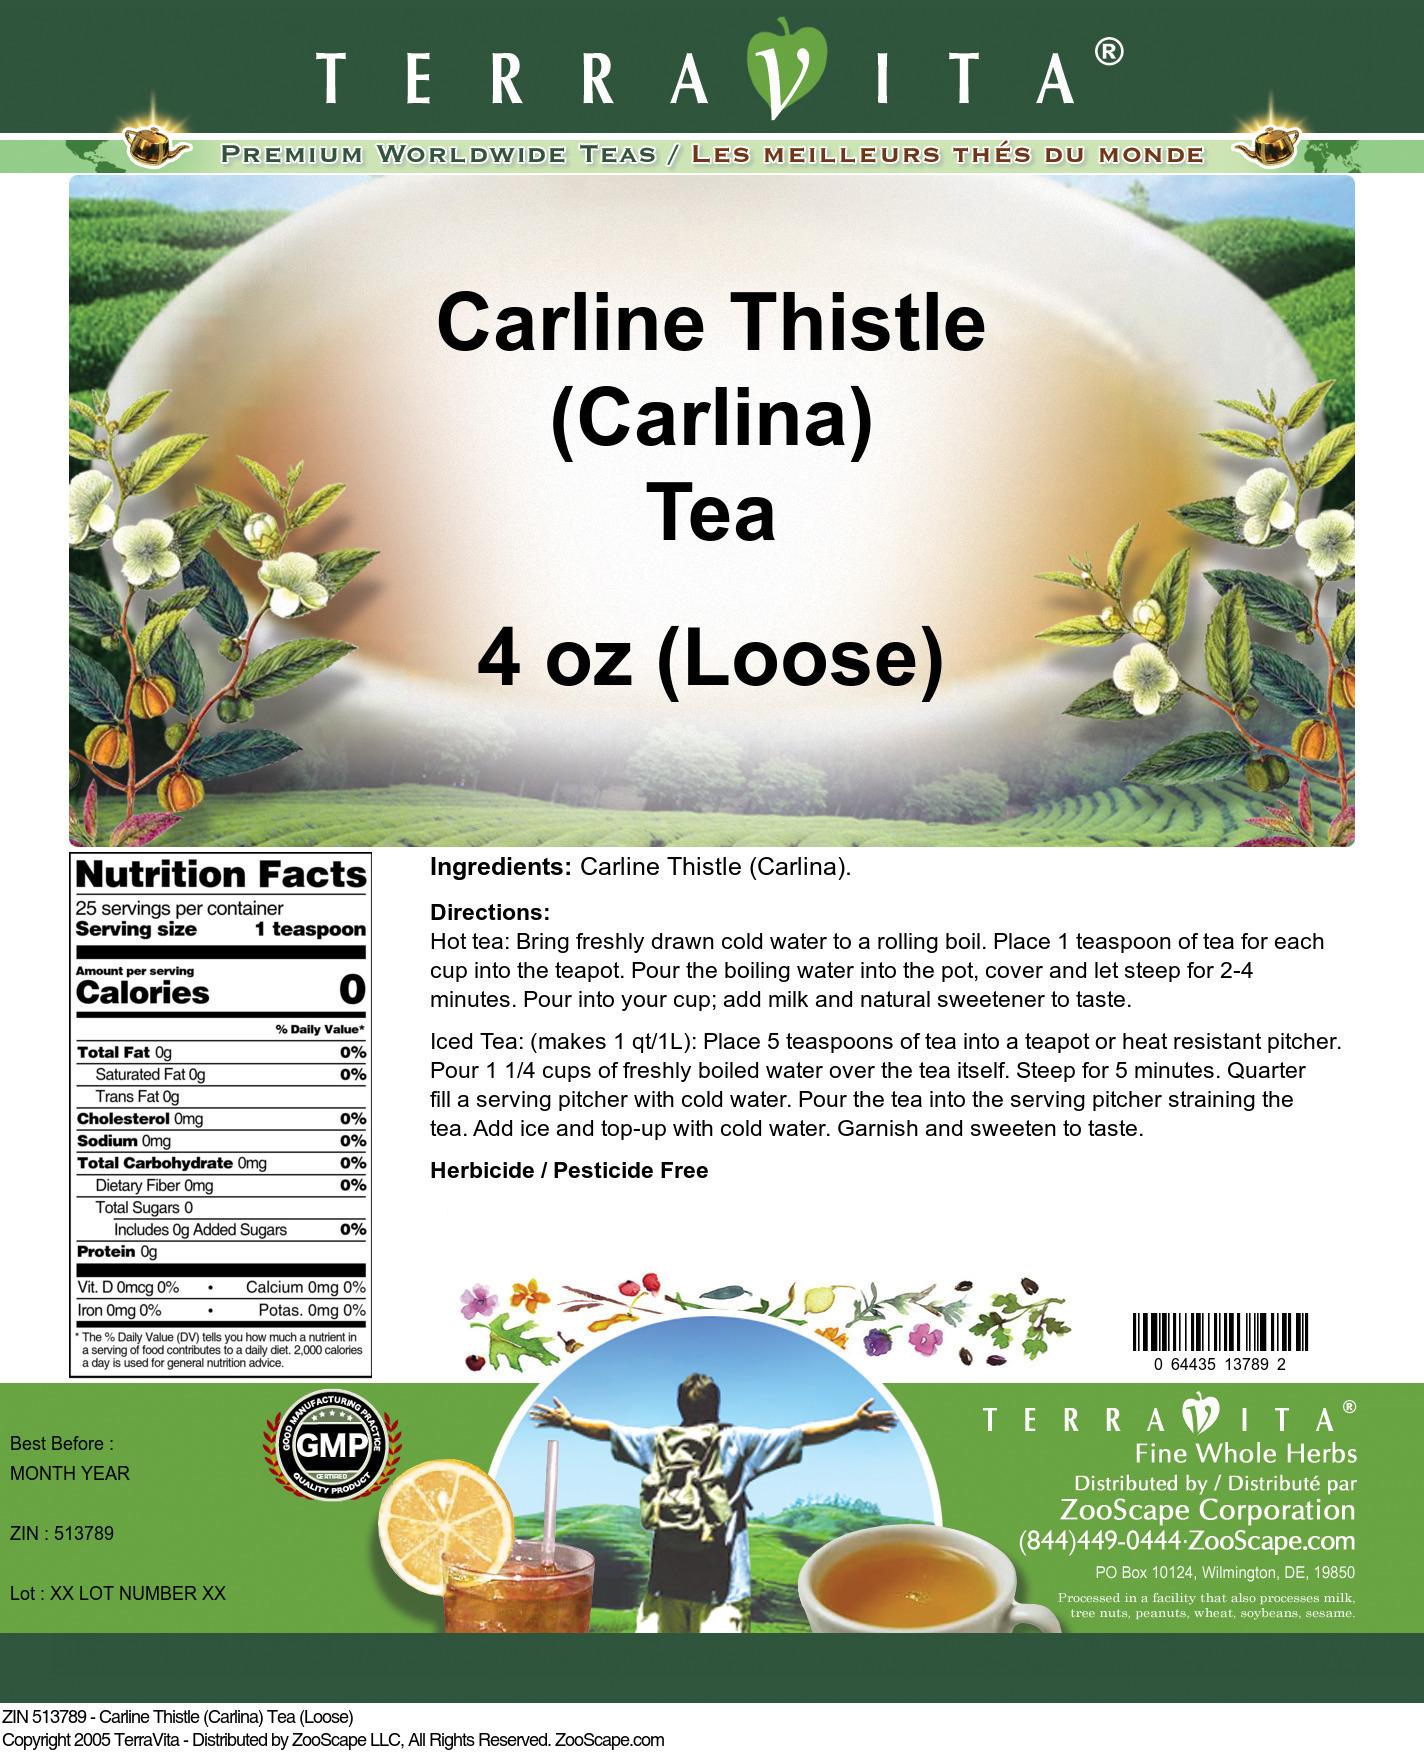 Carline Thistle (Carlina) Tea (Loose)